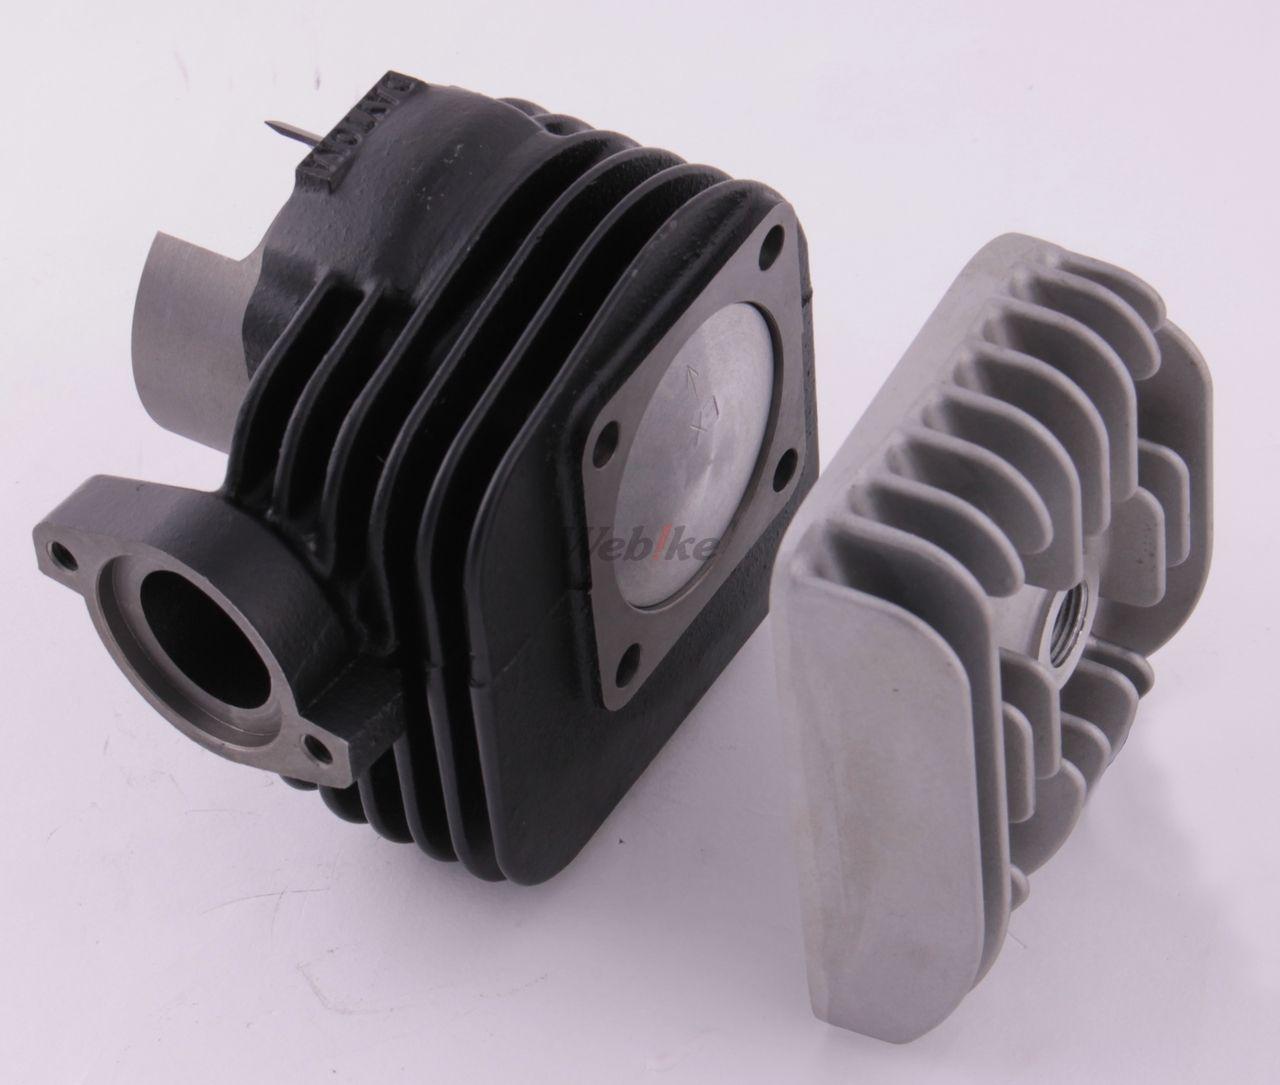 【DAYTONA】Super DRAG大口徑套件(鋼 汽缸 )原附一種用 - 「Webike-摩托百貨」